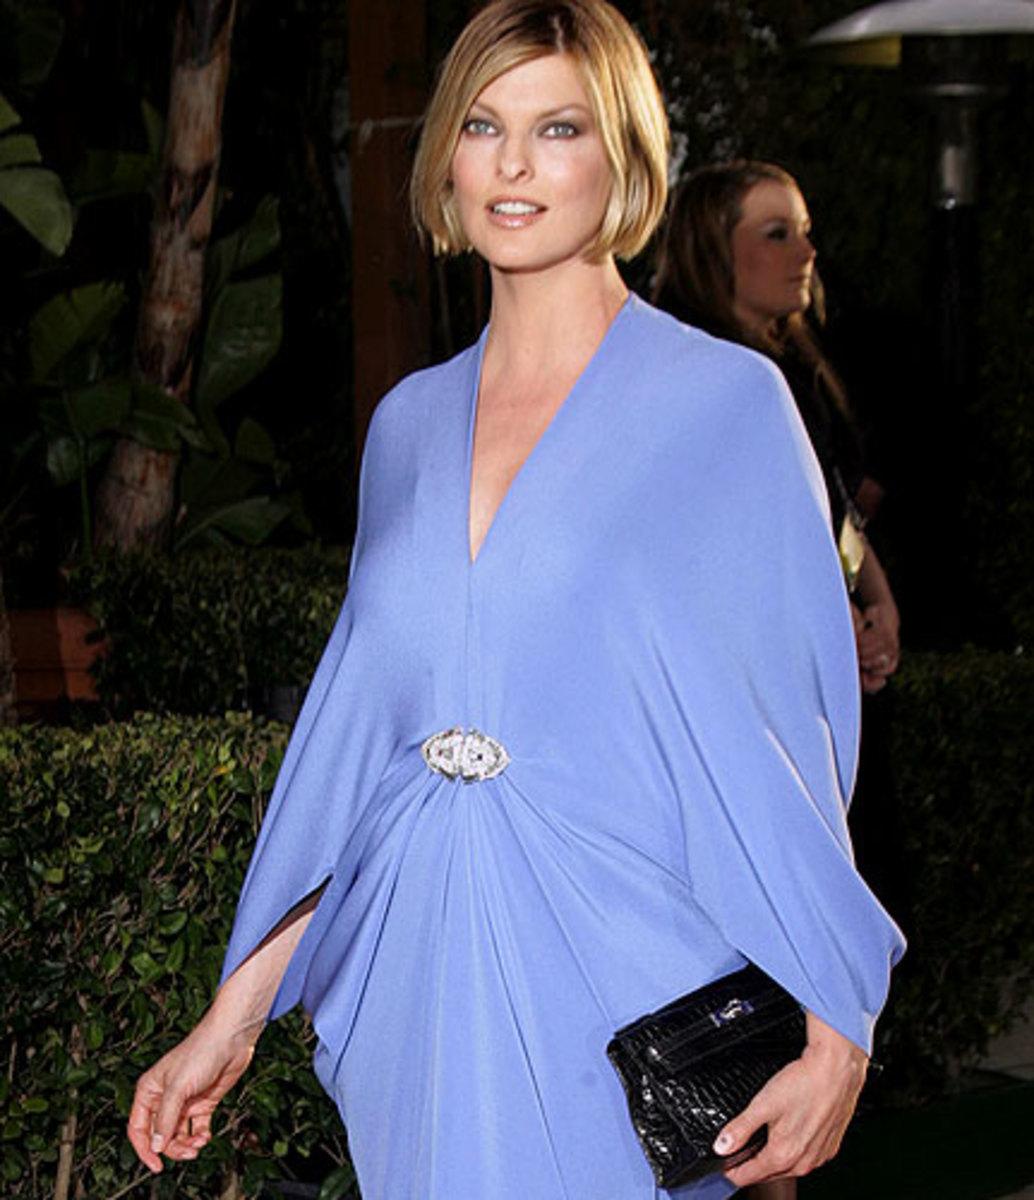 Linda Evangelista's Blonde Short Hair (Photo from virginmedia)